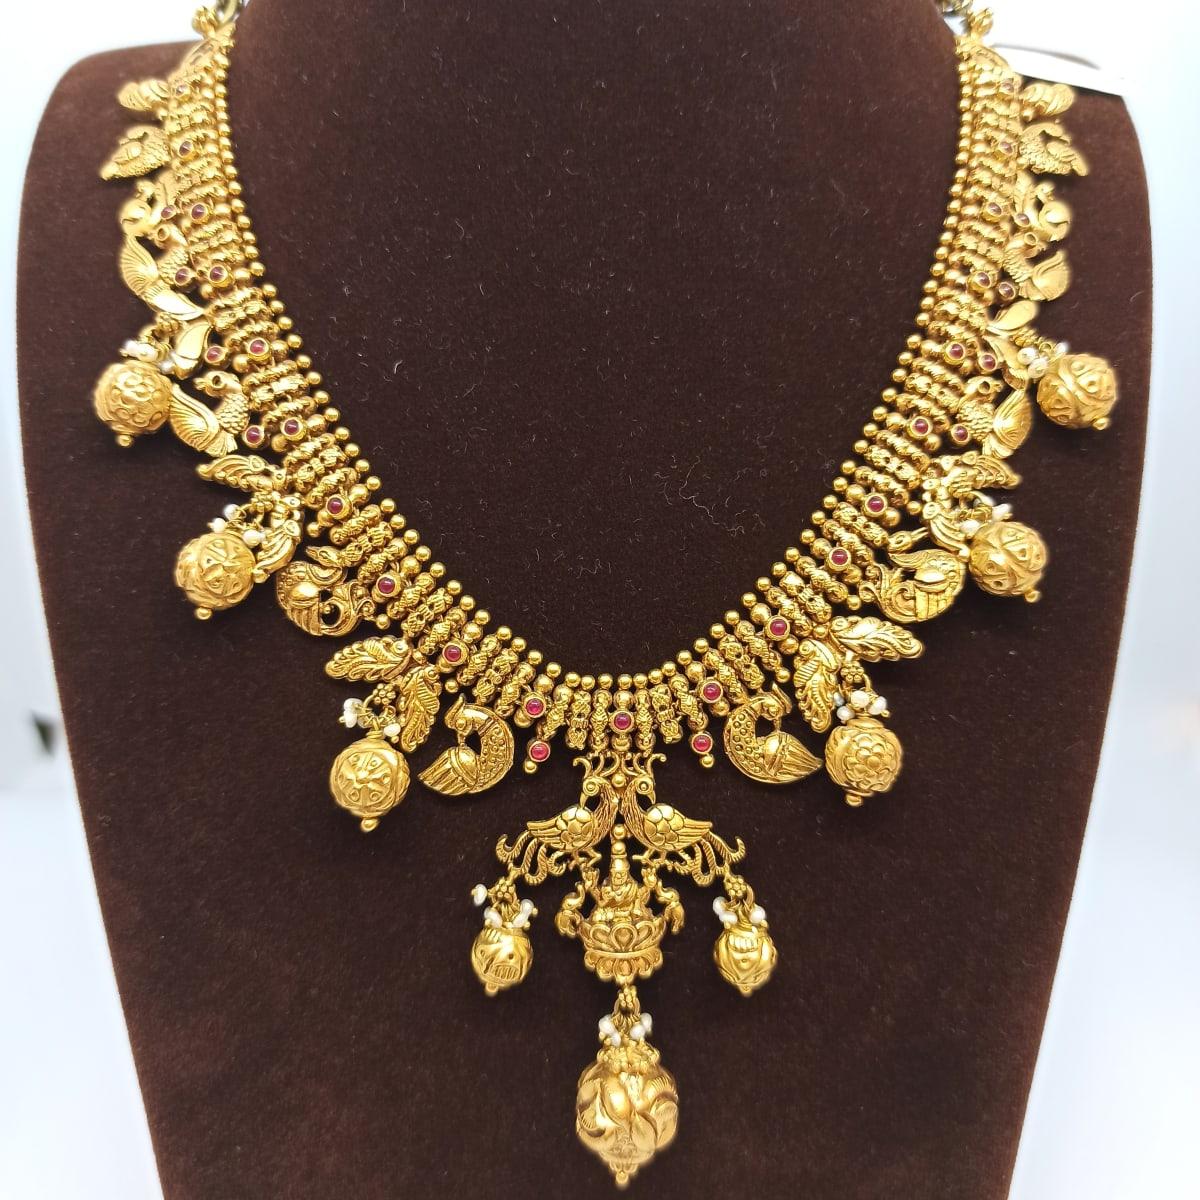 Pecock Antique Necklace